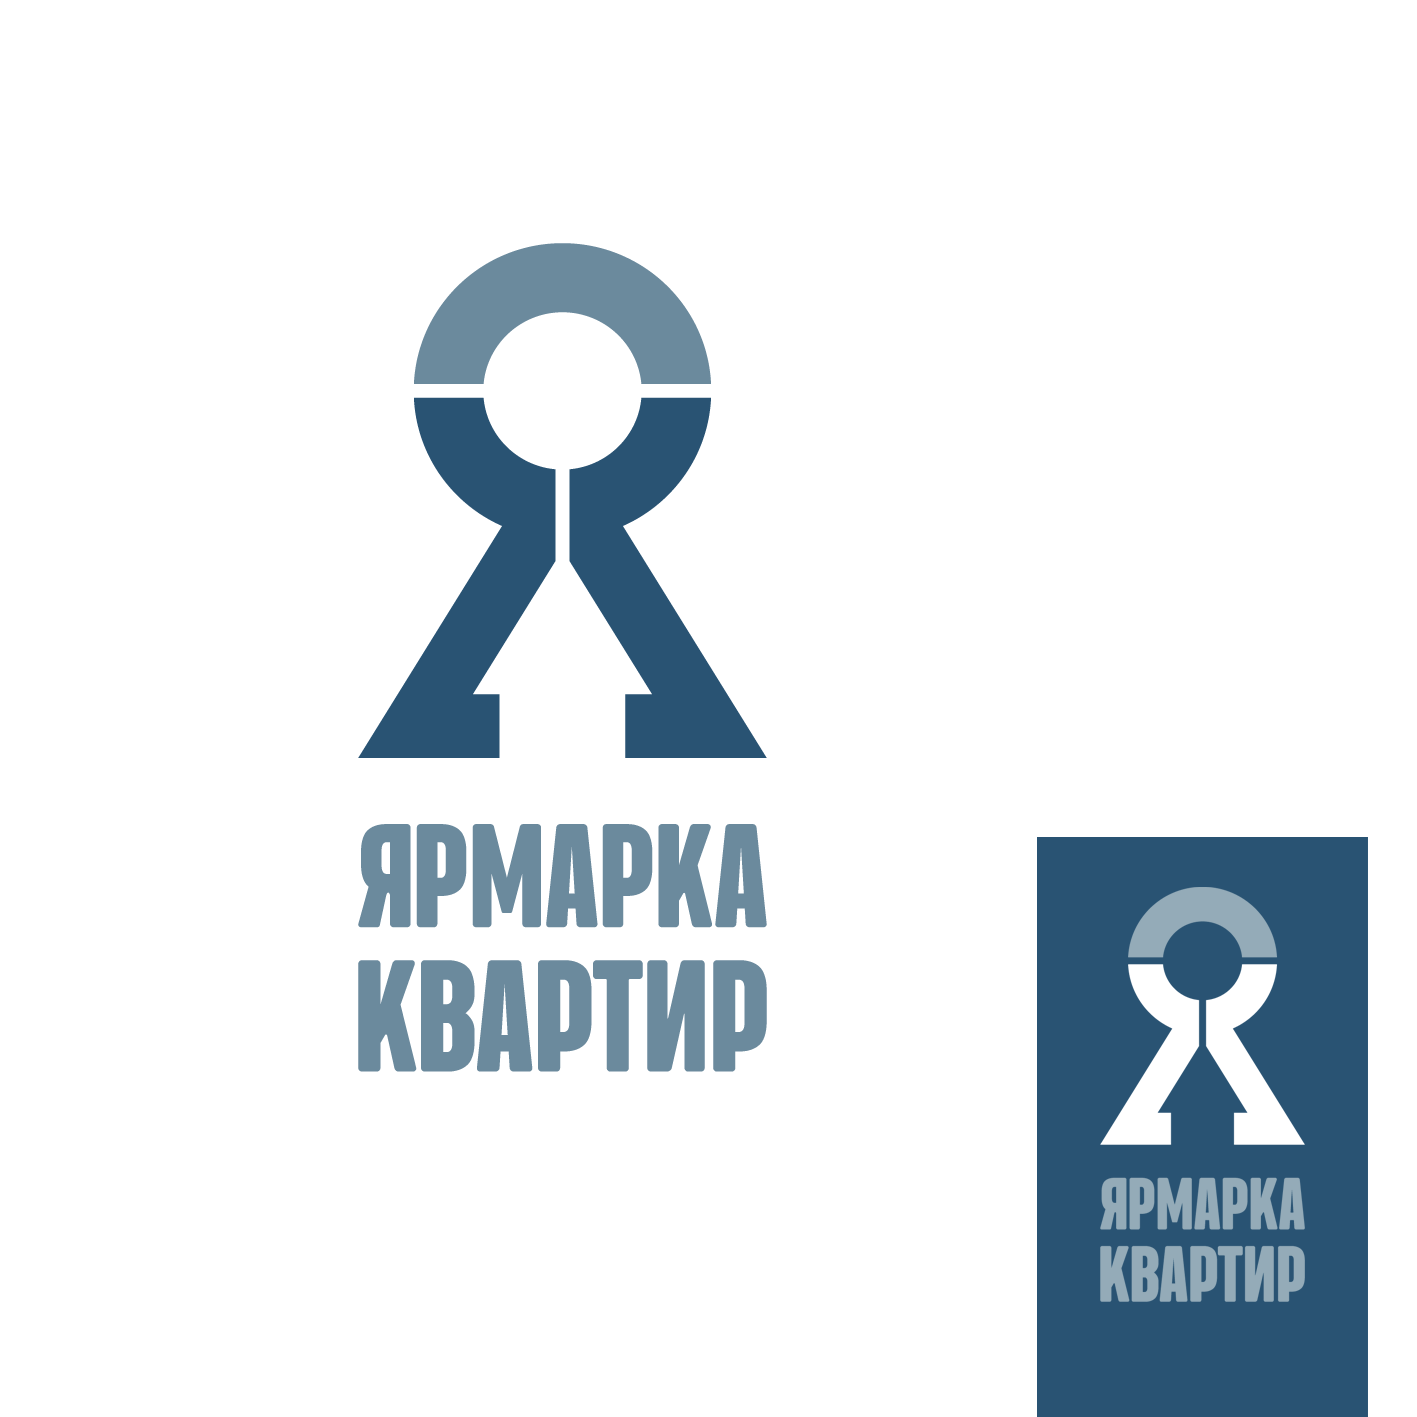 Создание логотипа, с вариантами для визитки и листовки фото f_8536005fac7cf9a5.png